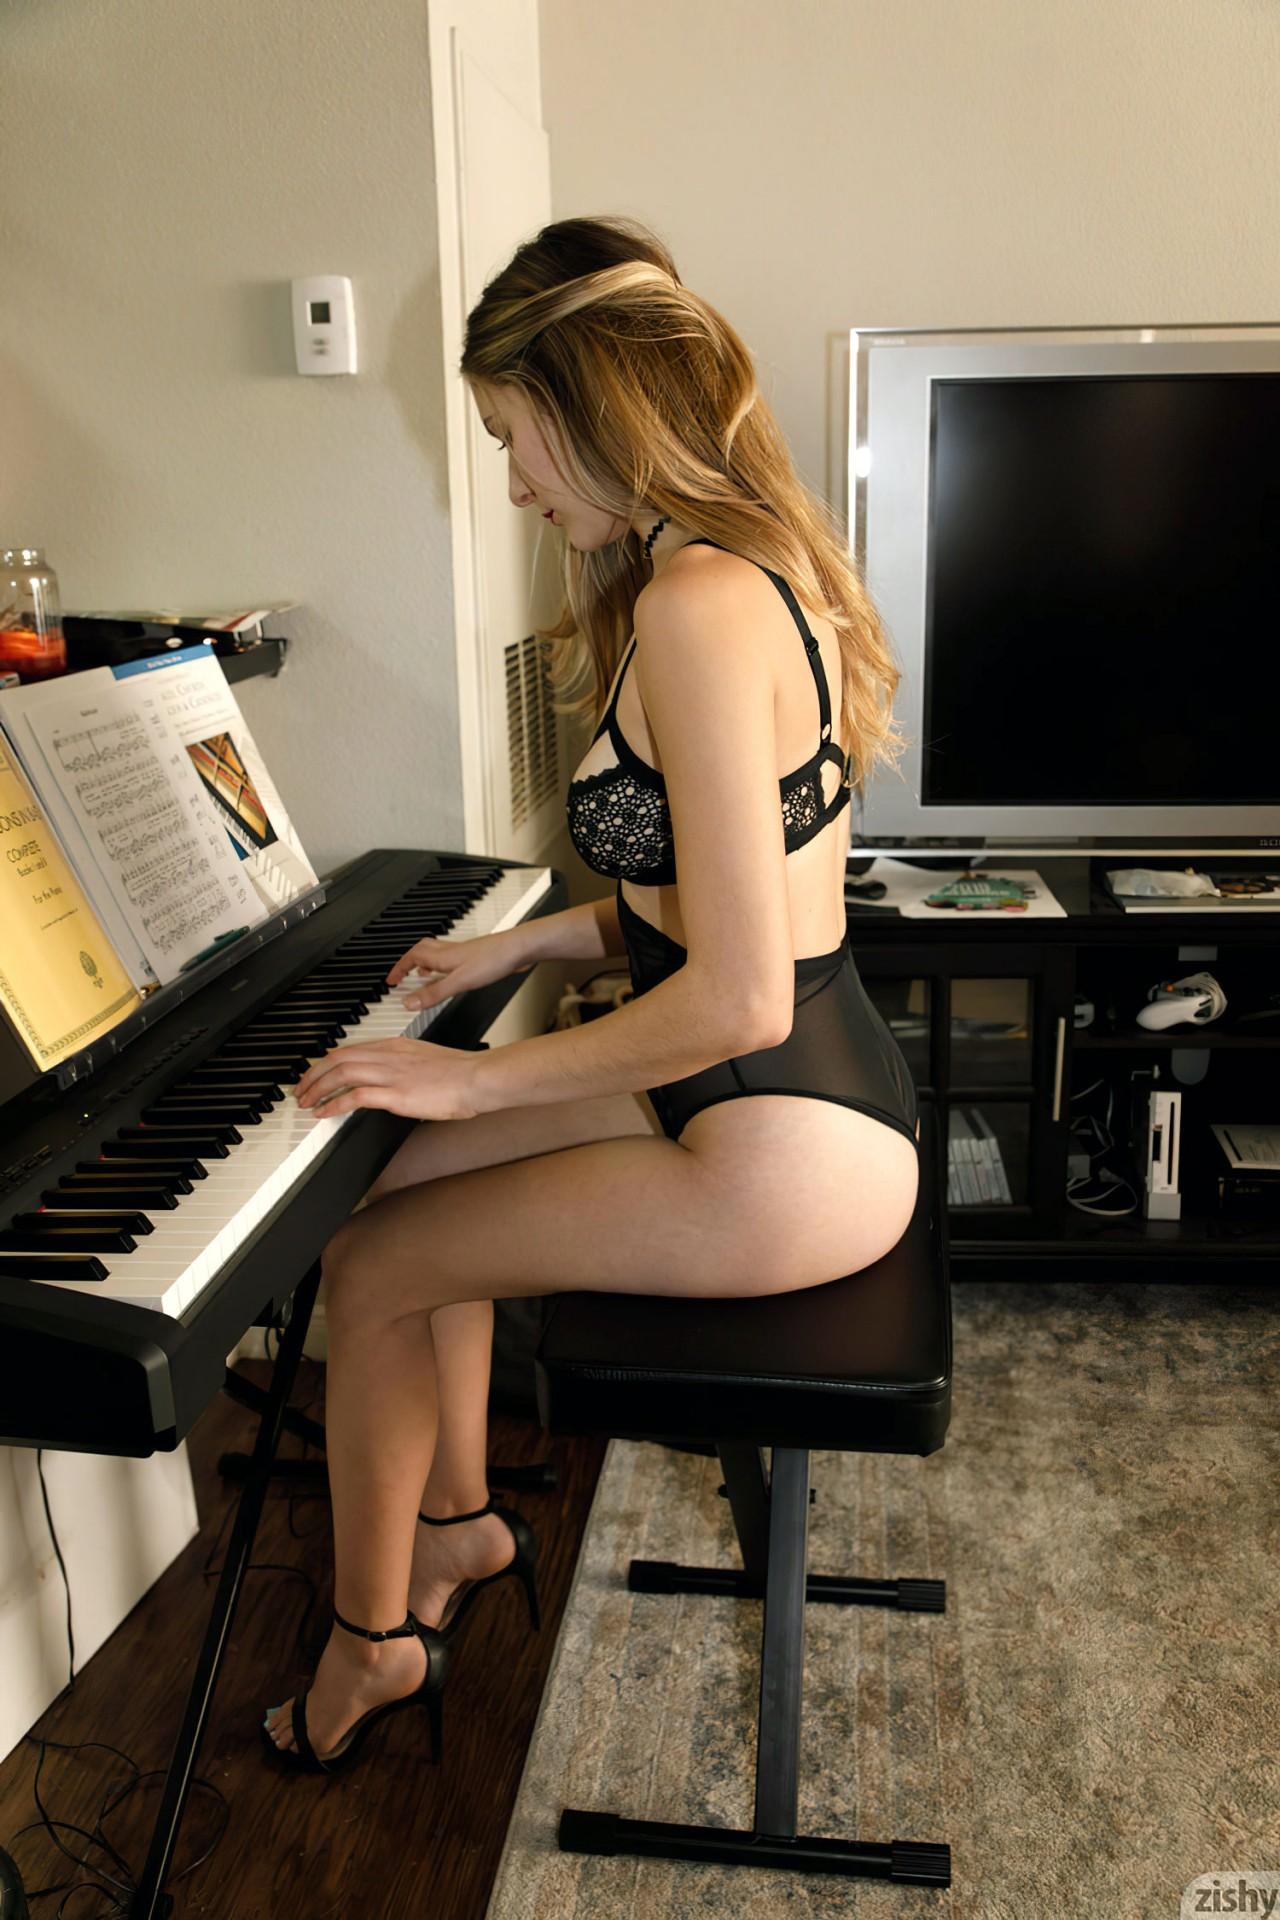 Pianista Safada (1)